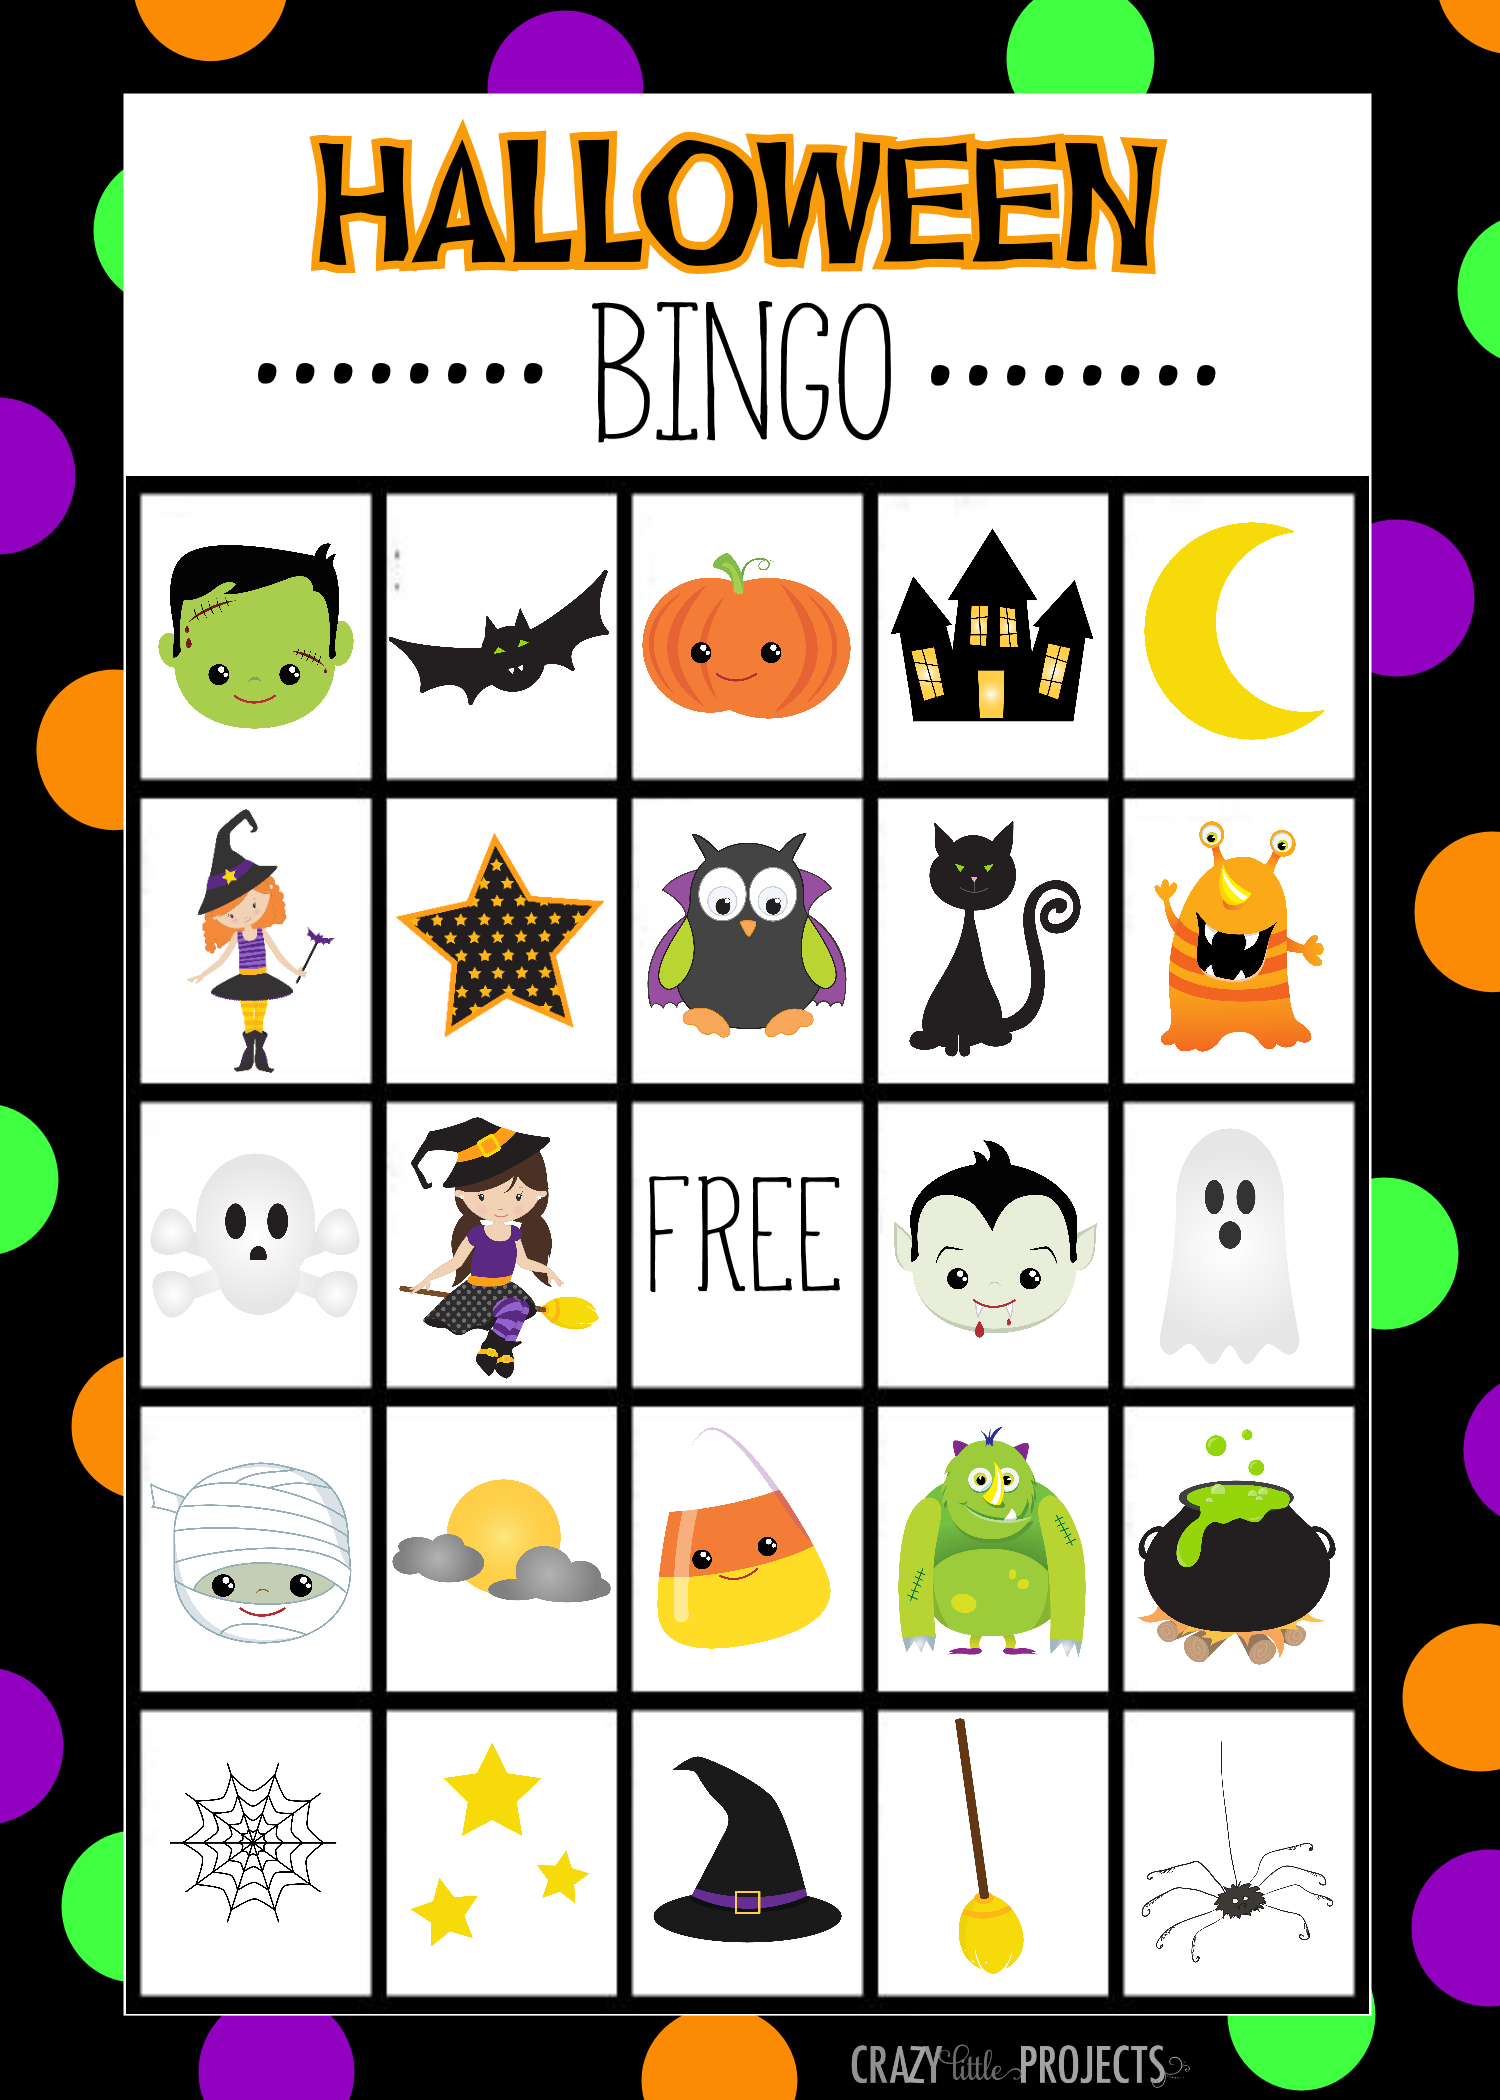 Halloween Bingo - Cute Free Printable Game | Halloween | Pinterest - Free Printable Halloween Bingo